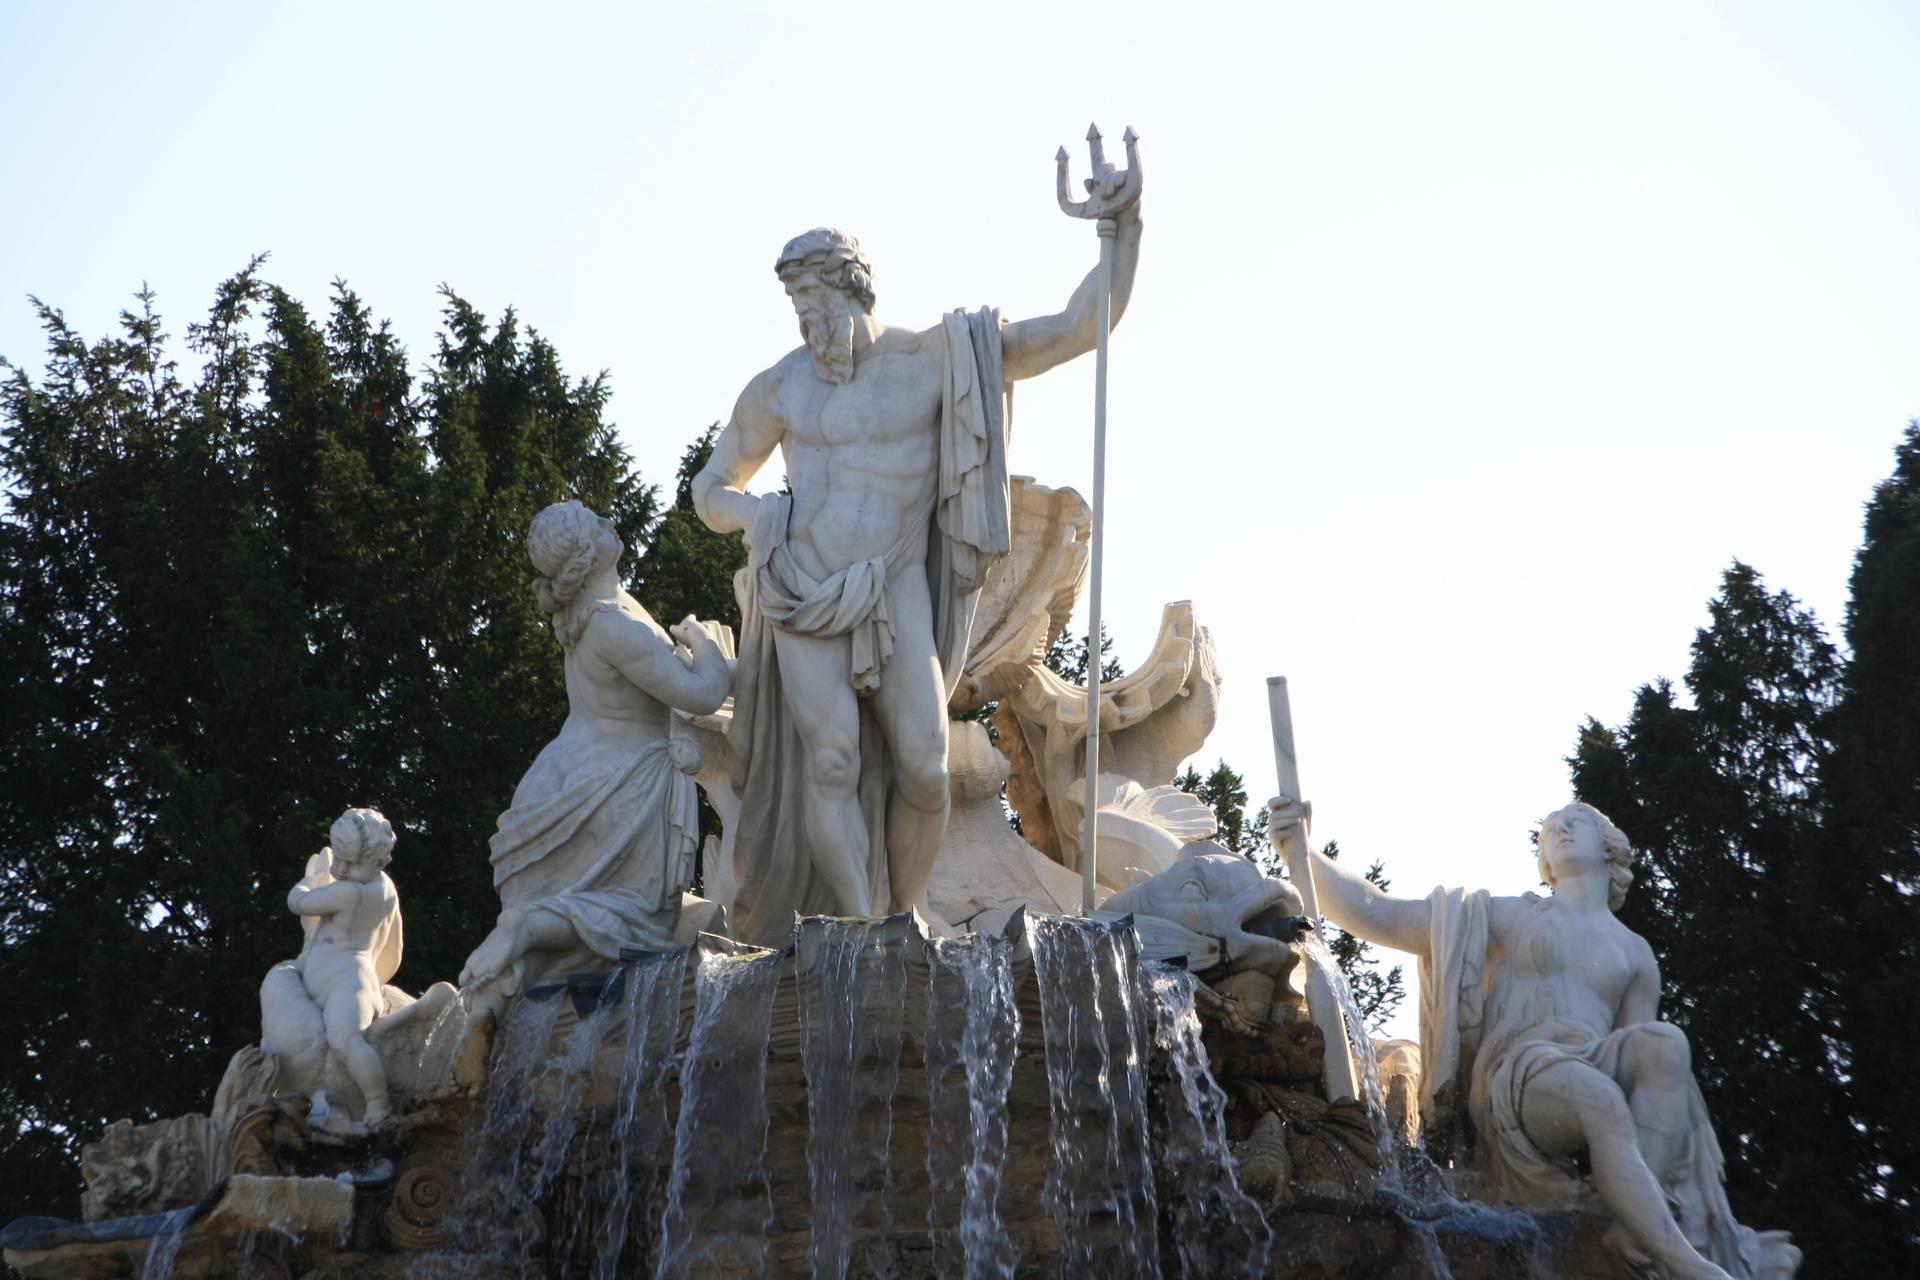 Statue at Schonbrun Palace in Vienna